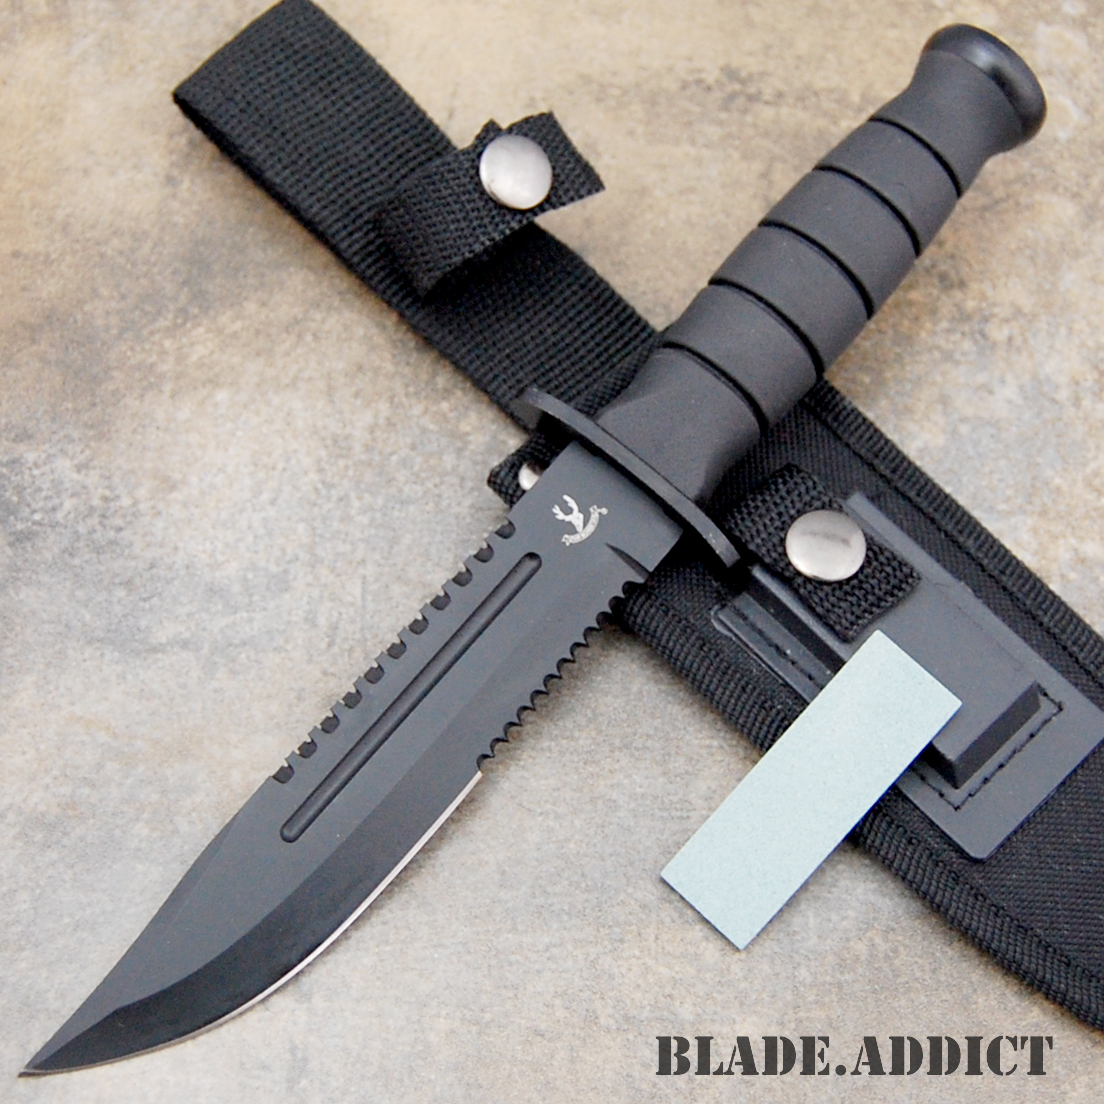 Survival knives for sale in canada edmonton